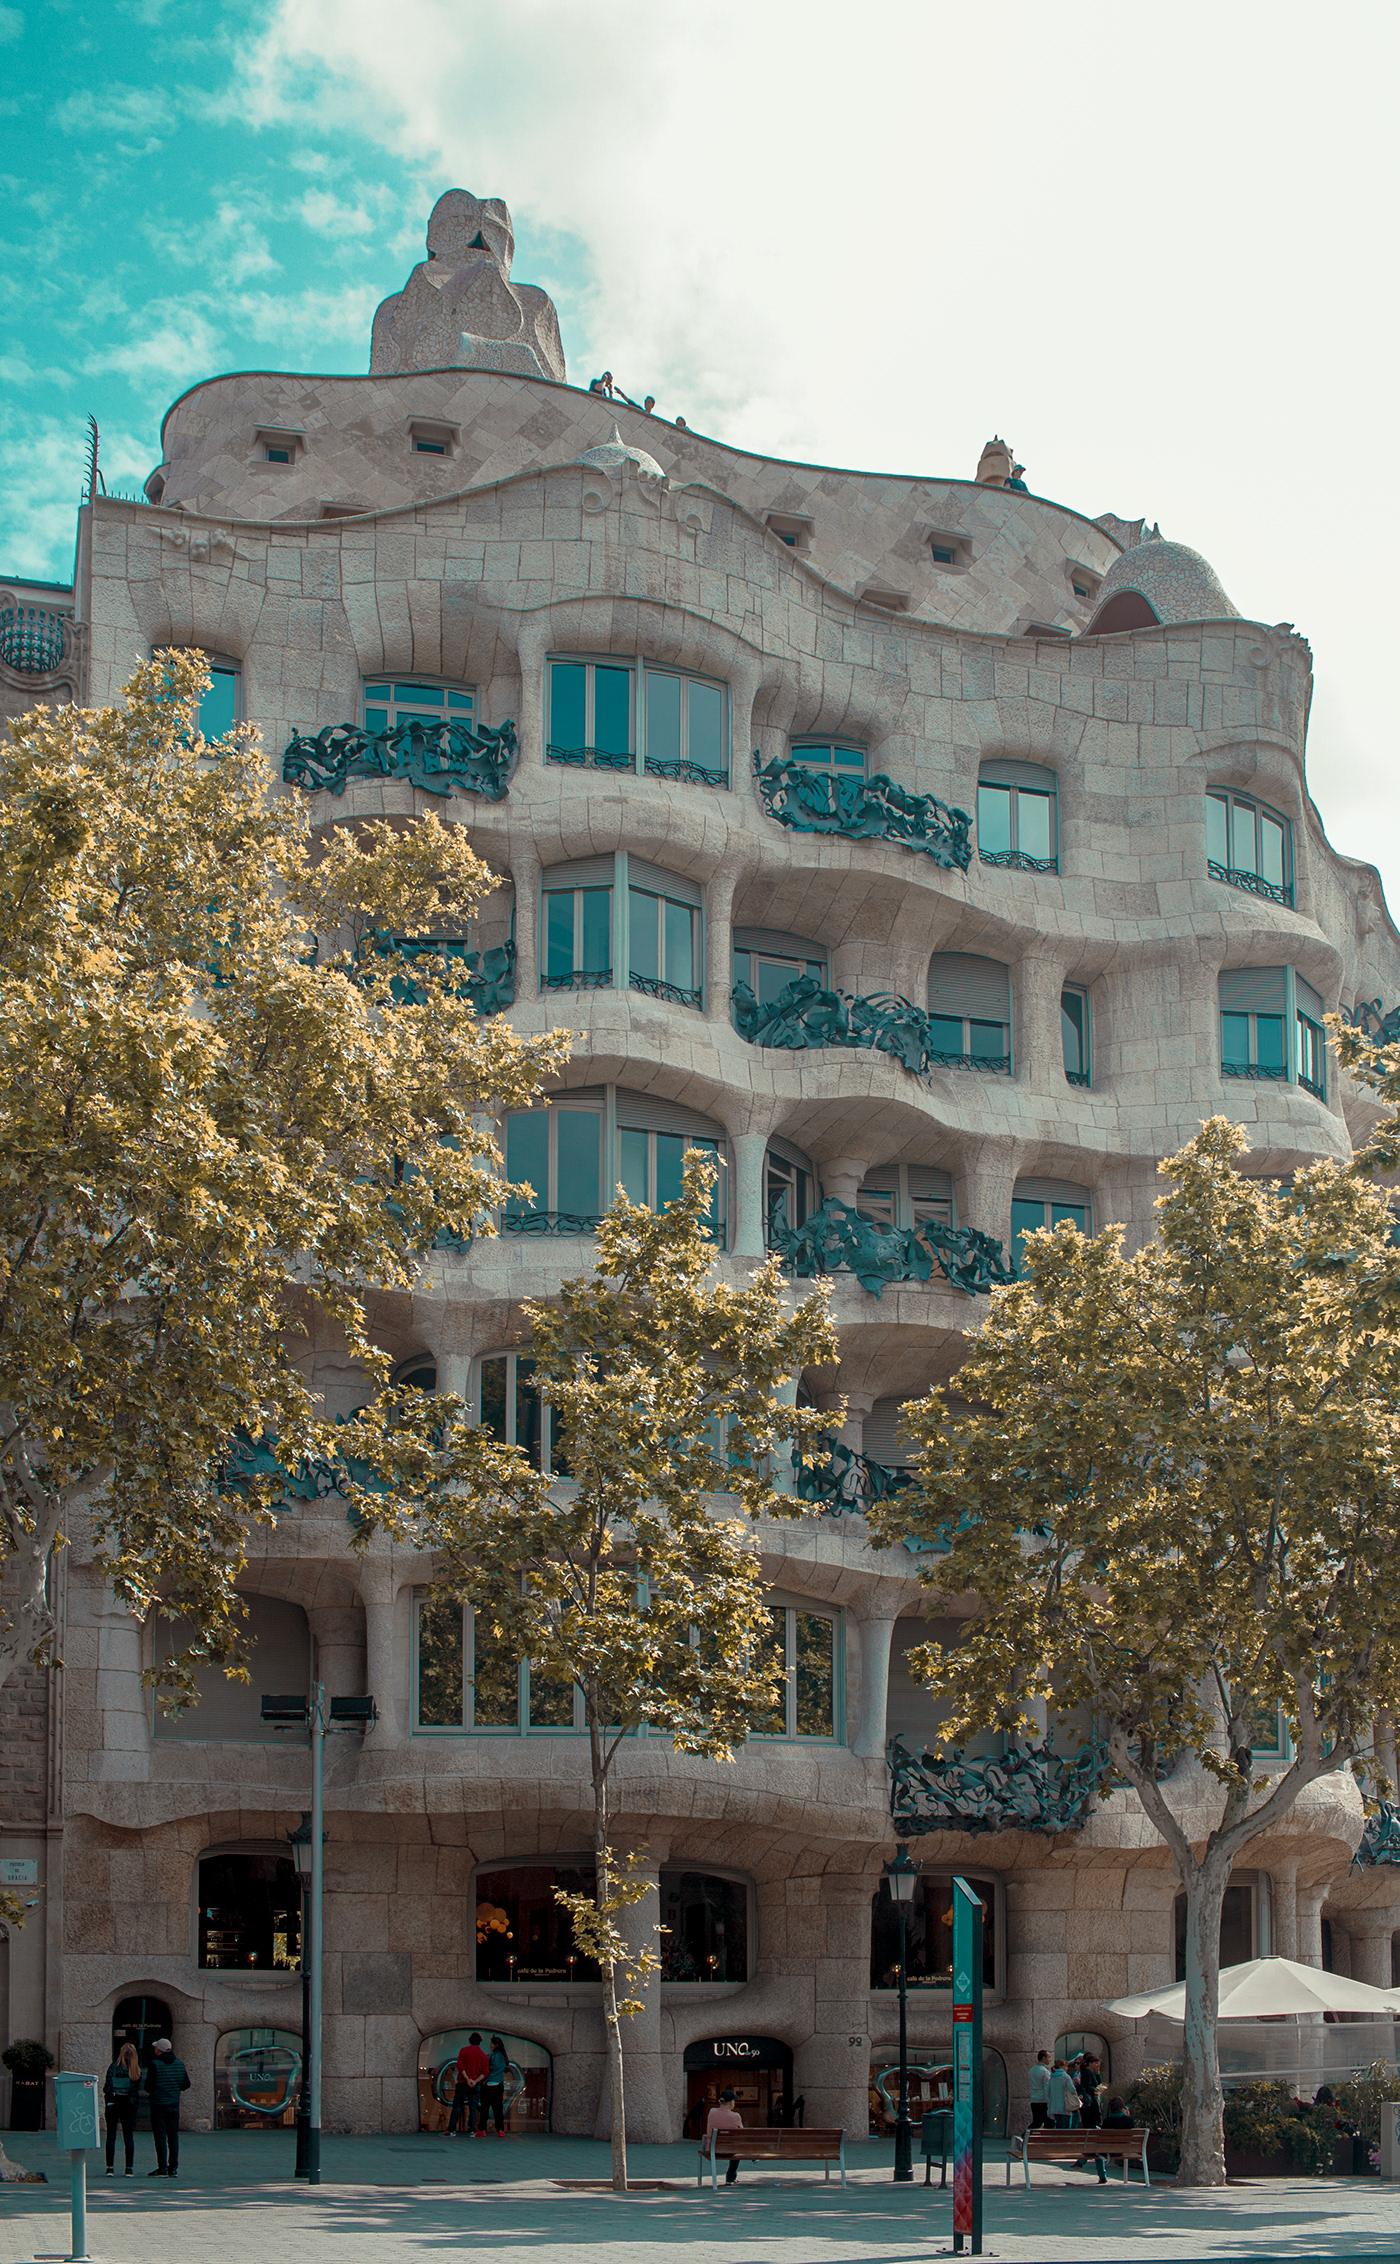 barcelona architecture city wes anderson Gaudi geometric colorful cyan rambla streets